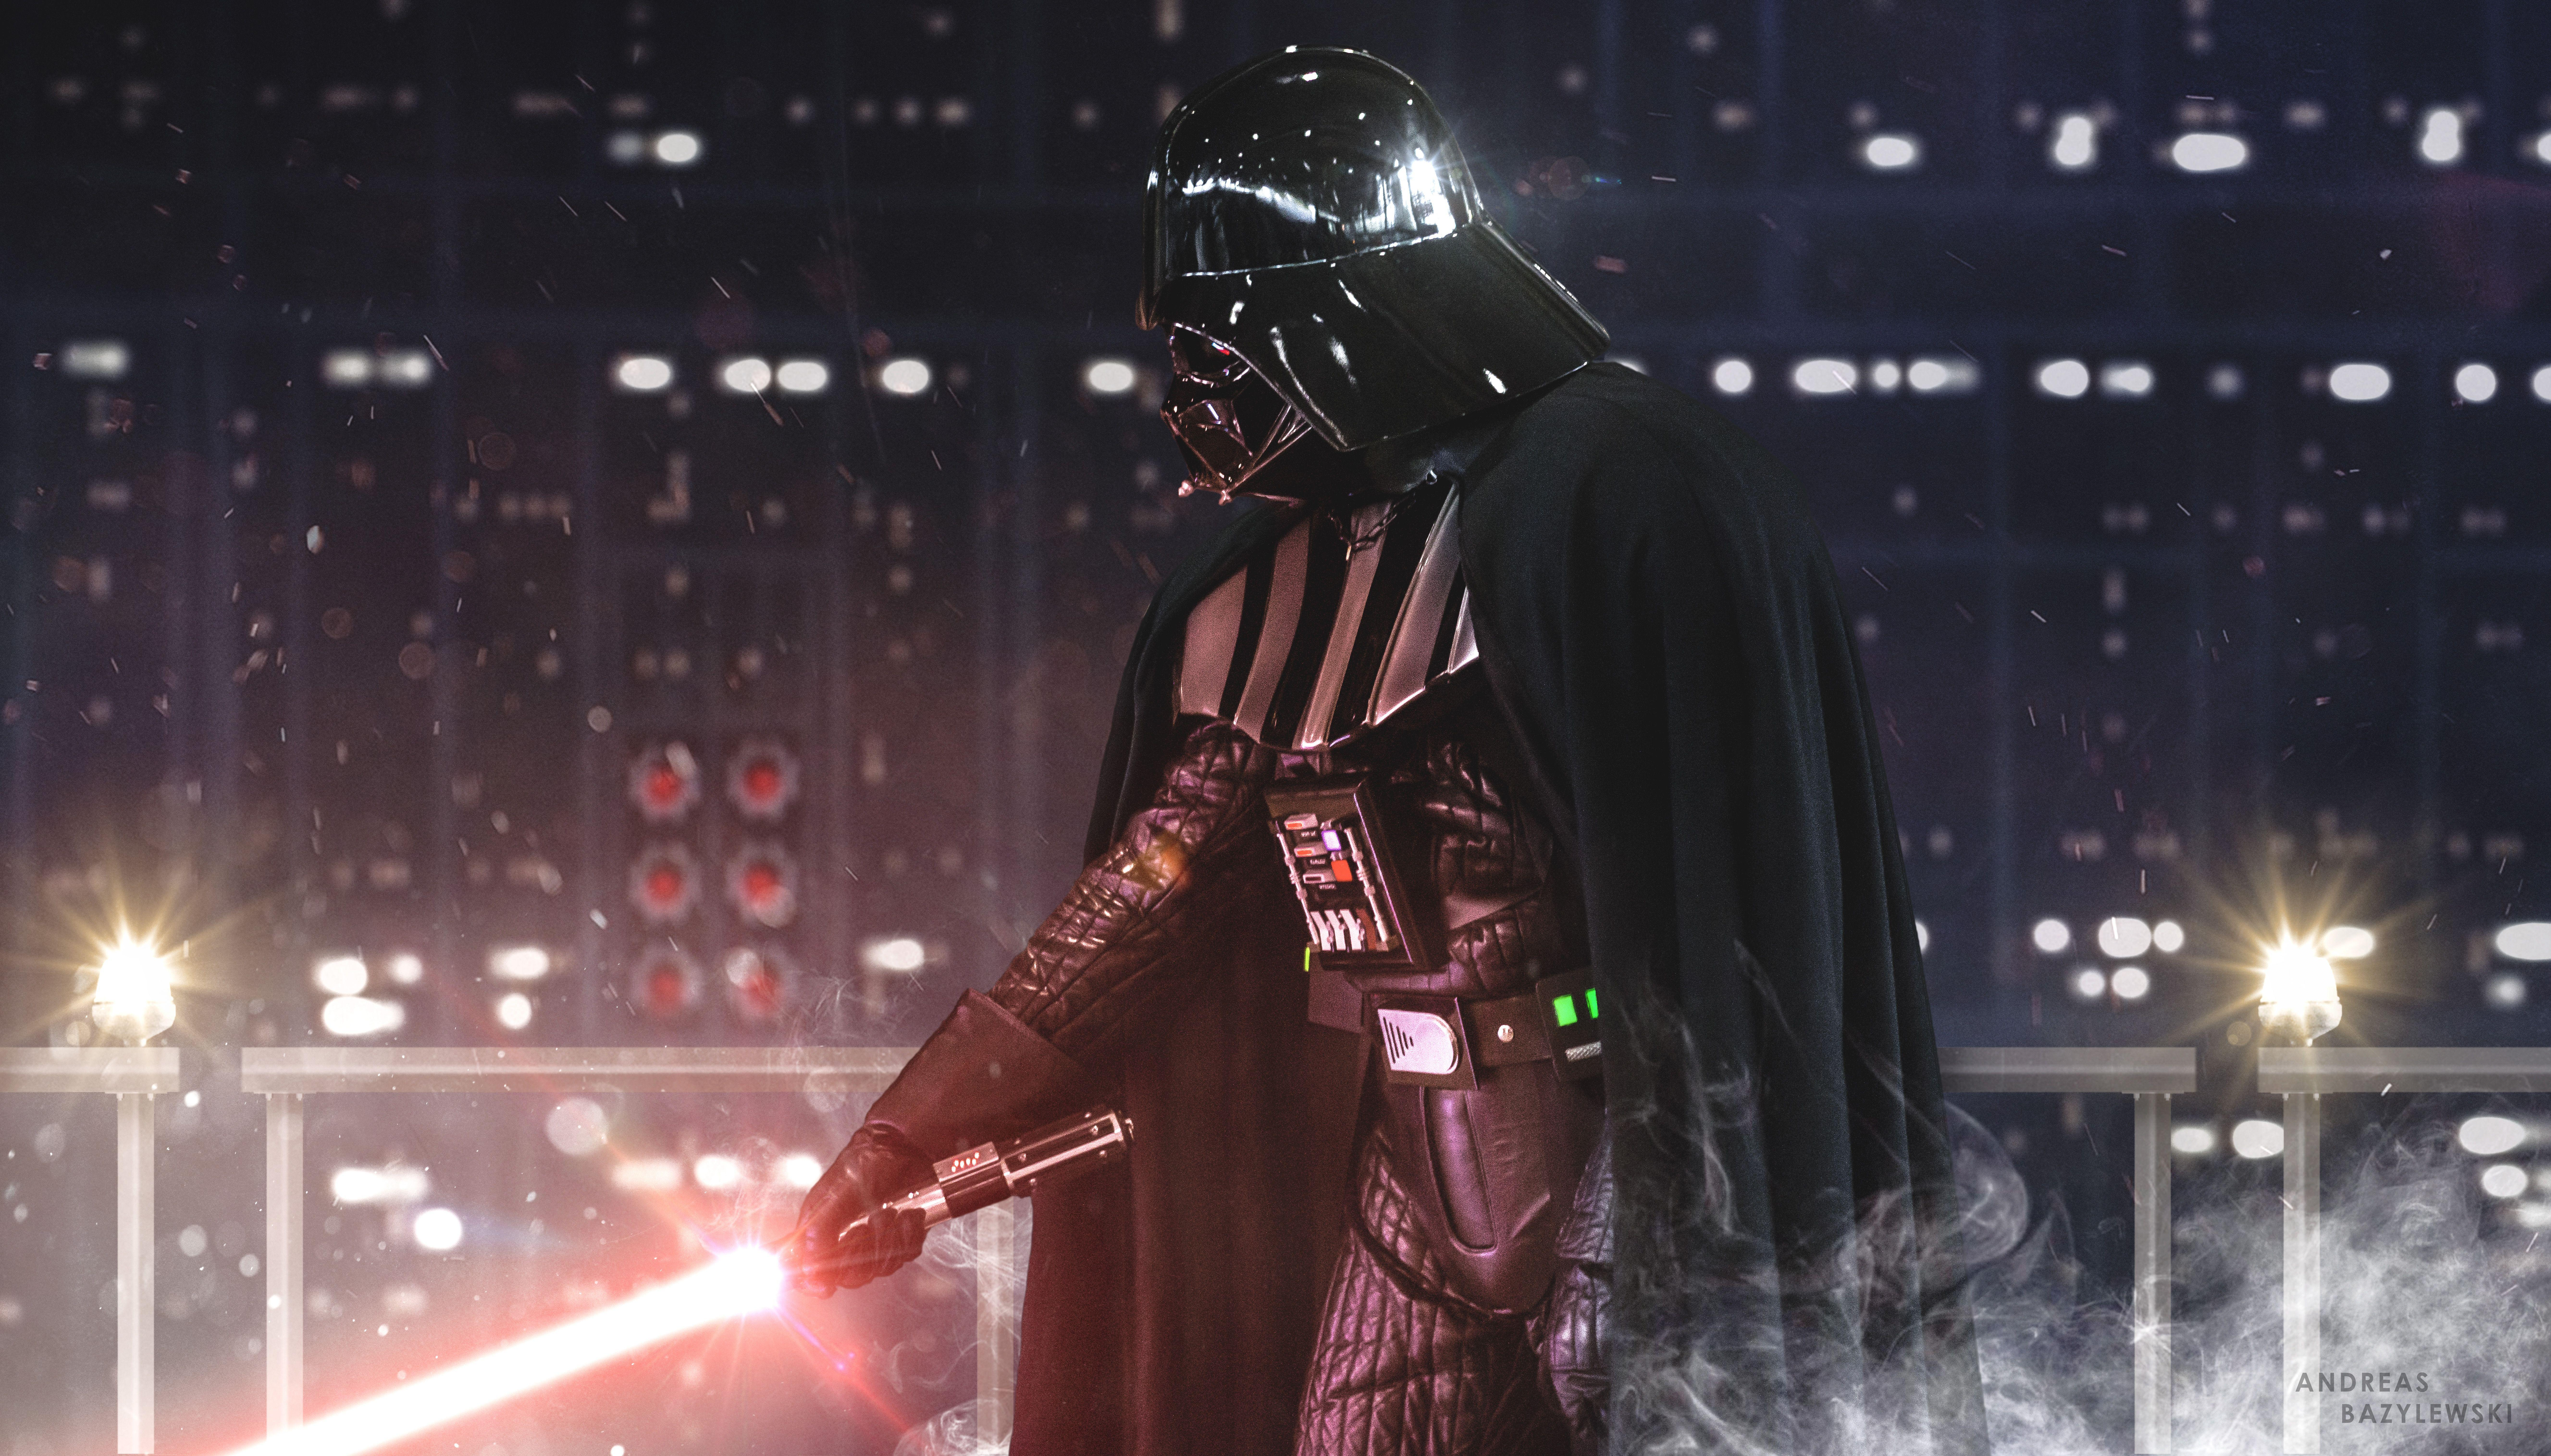 Darth Vader Wallpapers Top Free Darth Vader Backgrounds